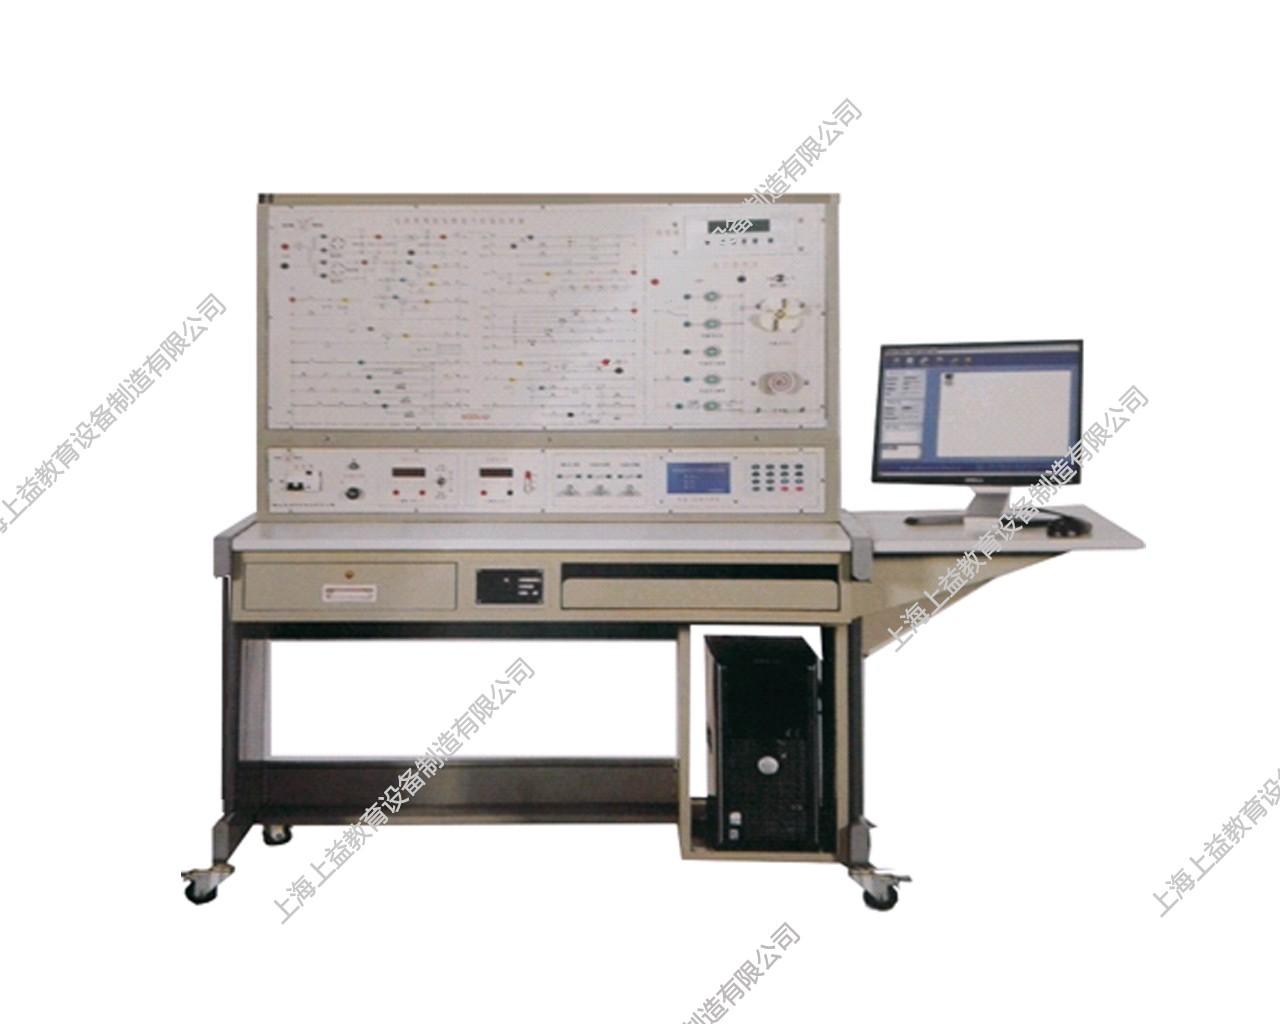 SYZLRX-08E型 家用电冰箱智能温控电气wwwlehu8viplehu68vip装置(无霜)